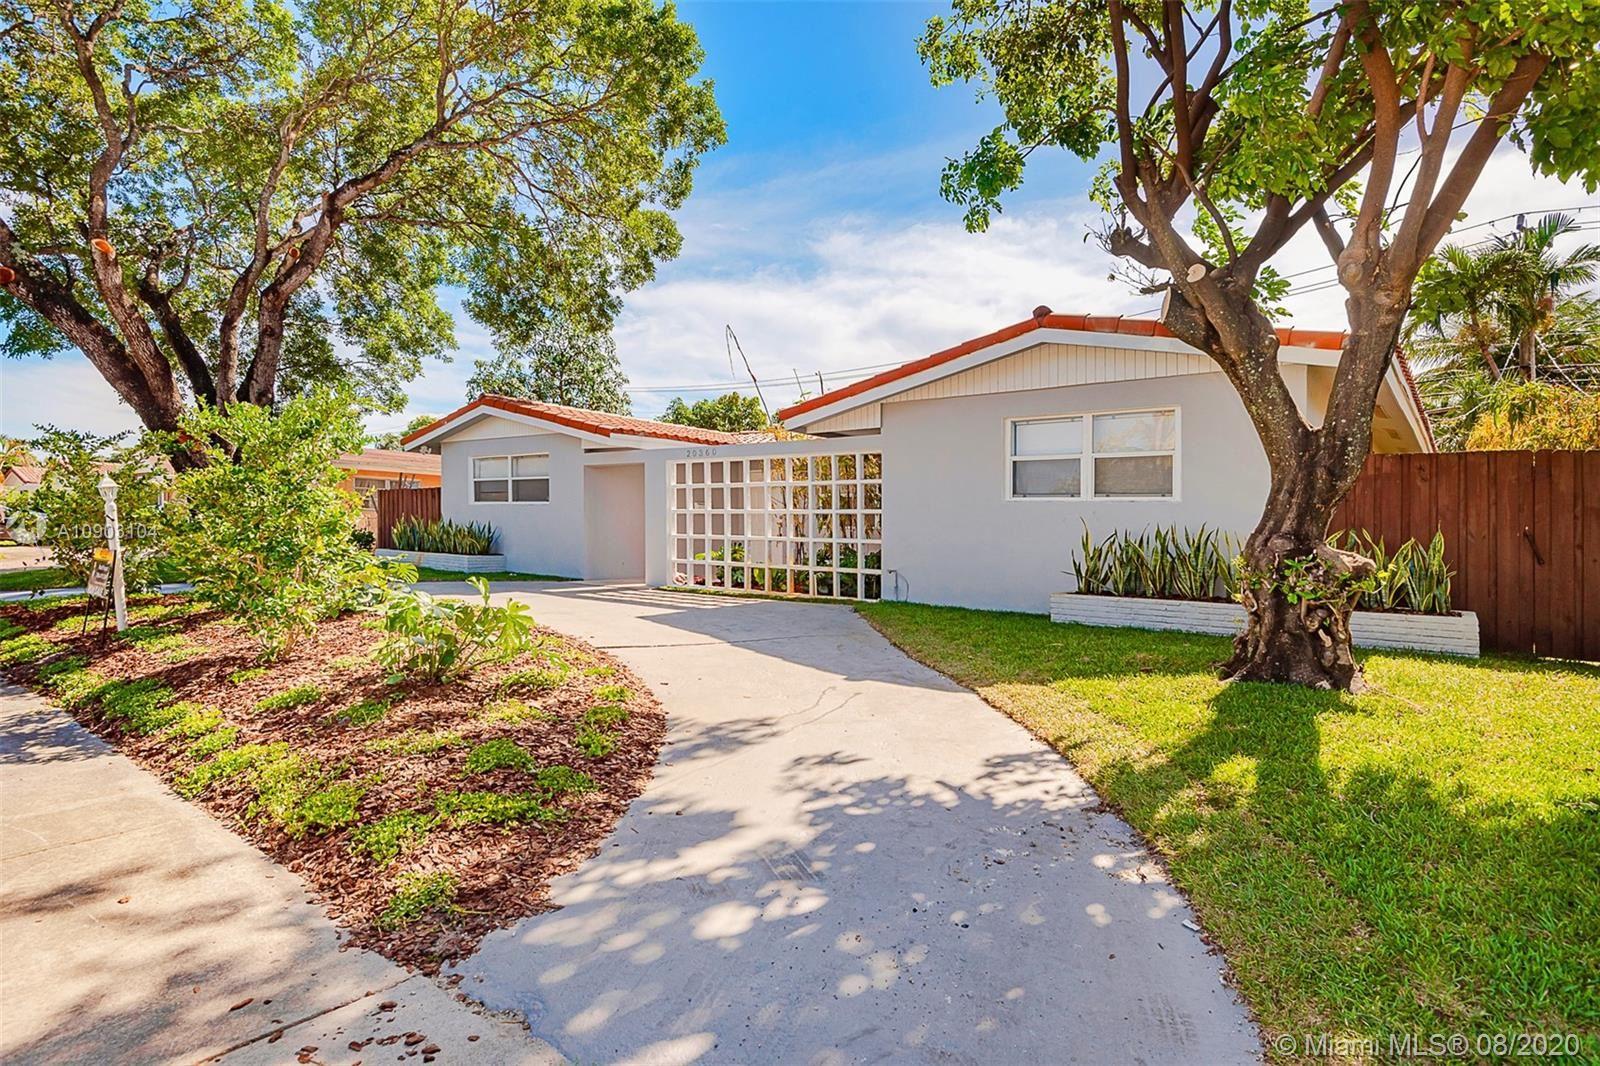 20360 Highland Lakes Blvd, Miami, FL 33179 - #: A10903104